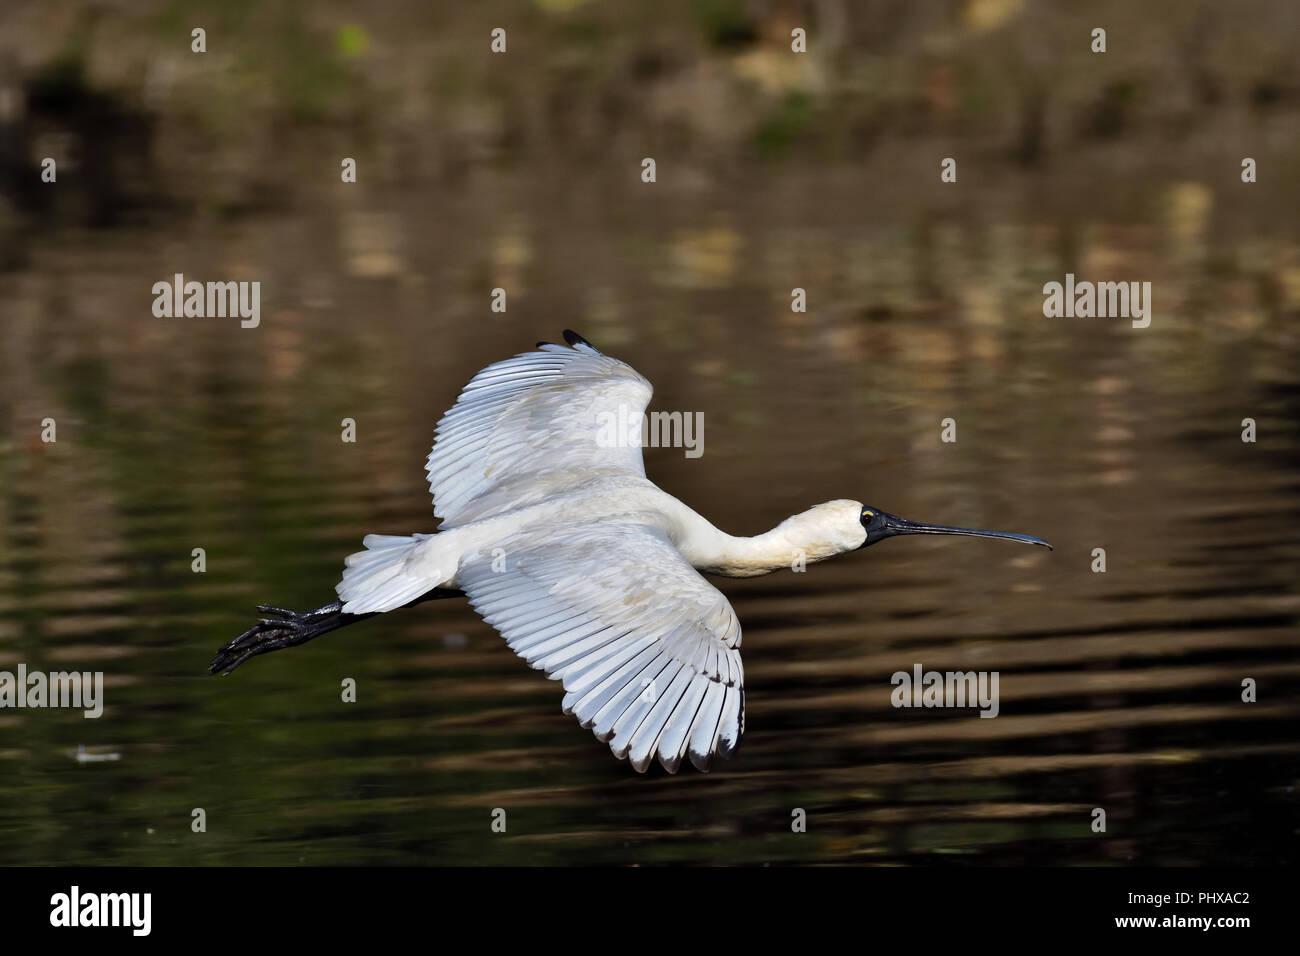 An Australian, Queensland Immature Royal Spoonbill ( Platalea regia ) flying low over a Lagoon Stock Photo